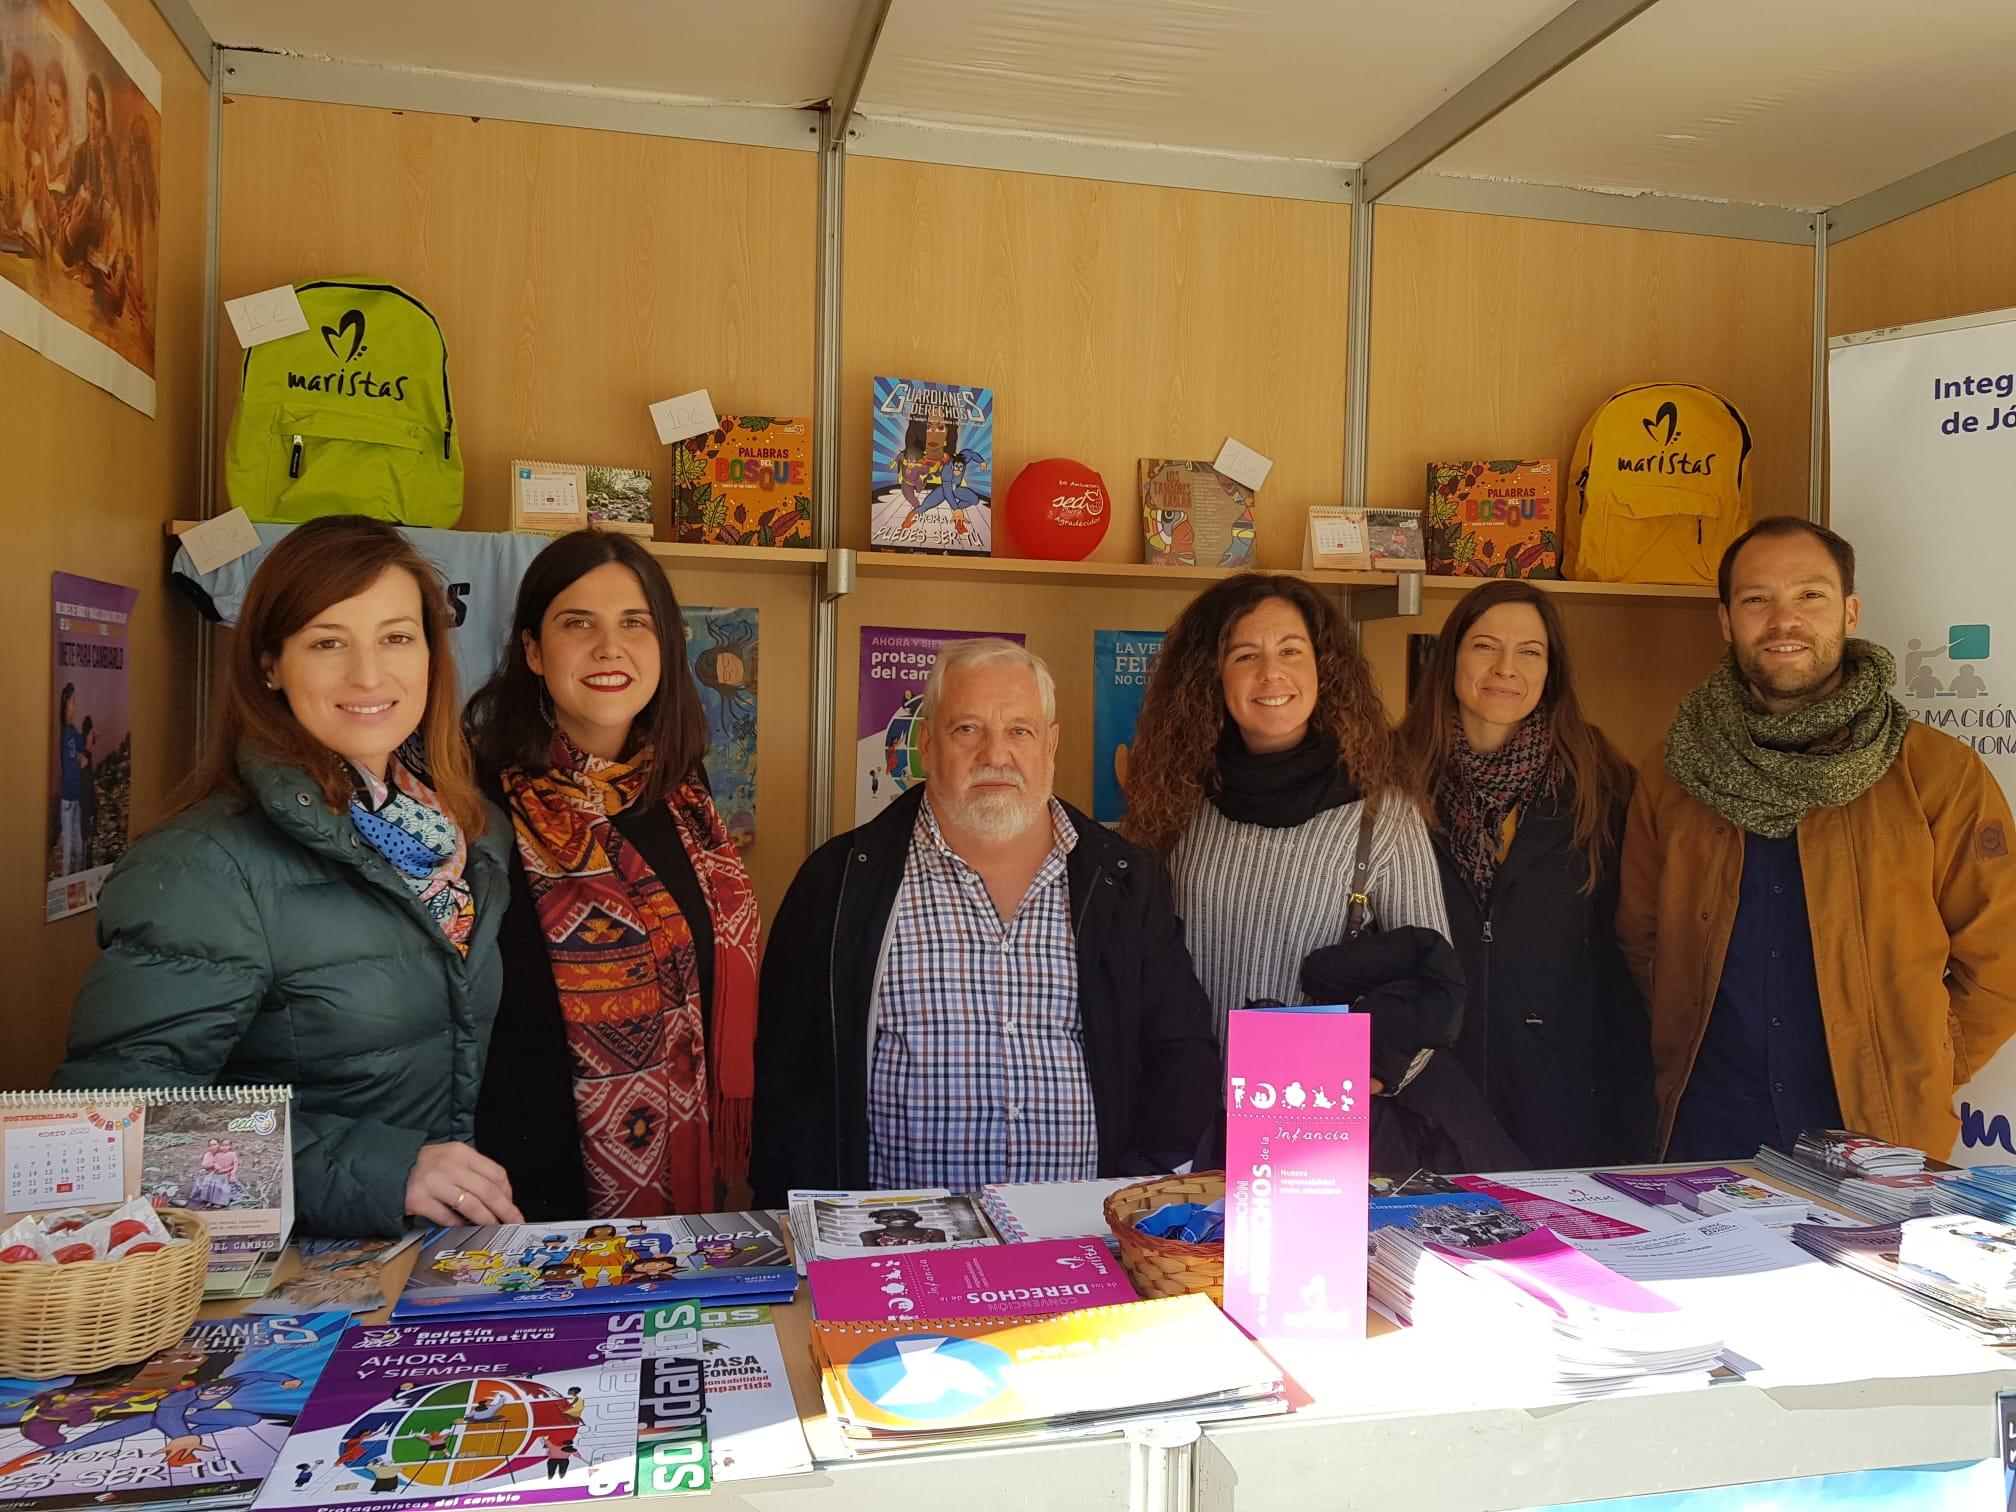 XIX Feria de Voluntariado de Murcia